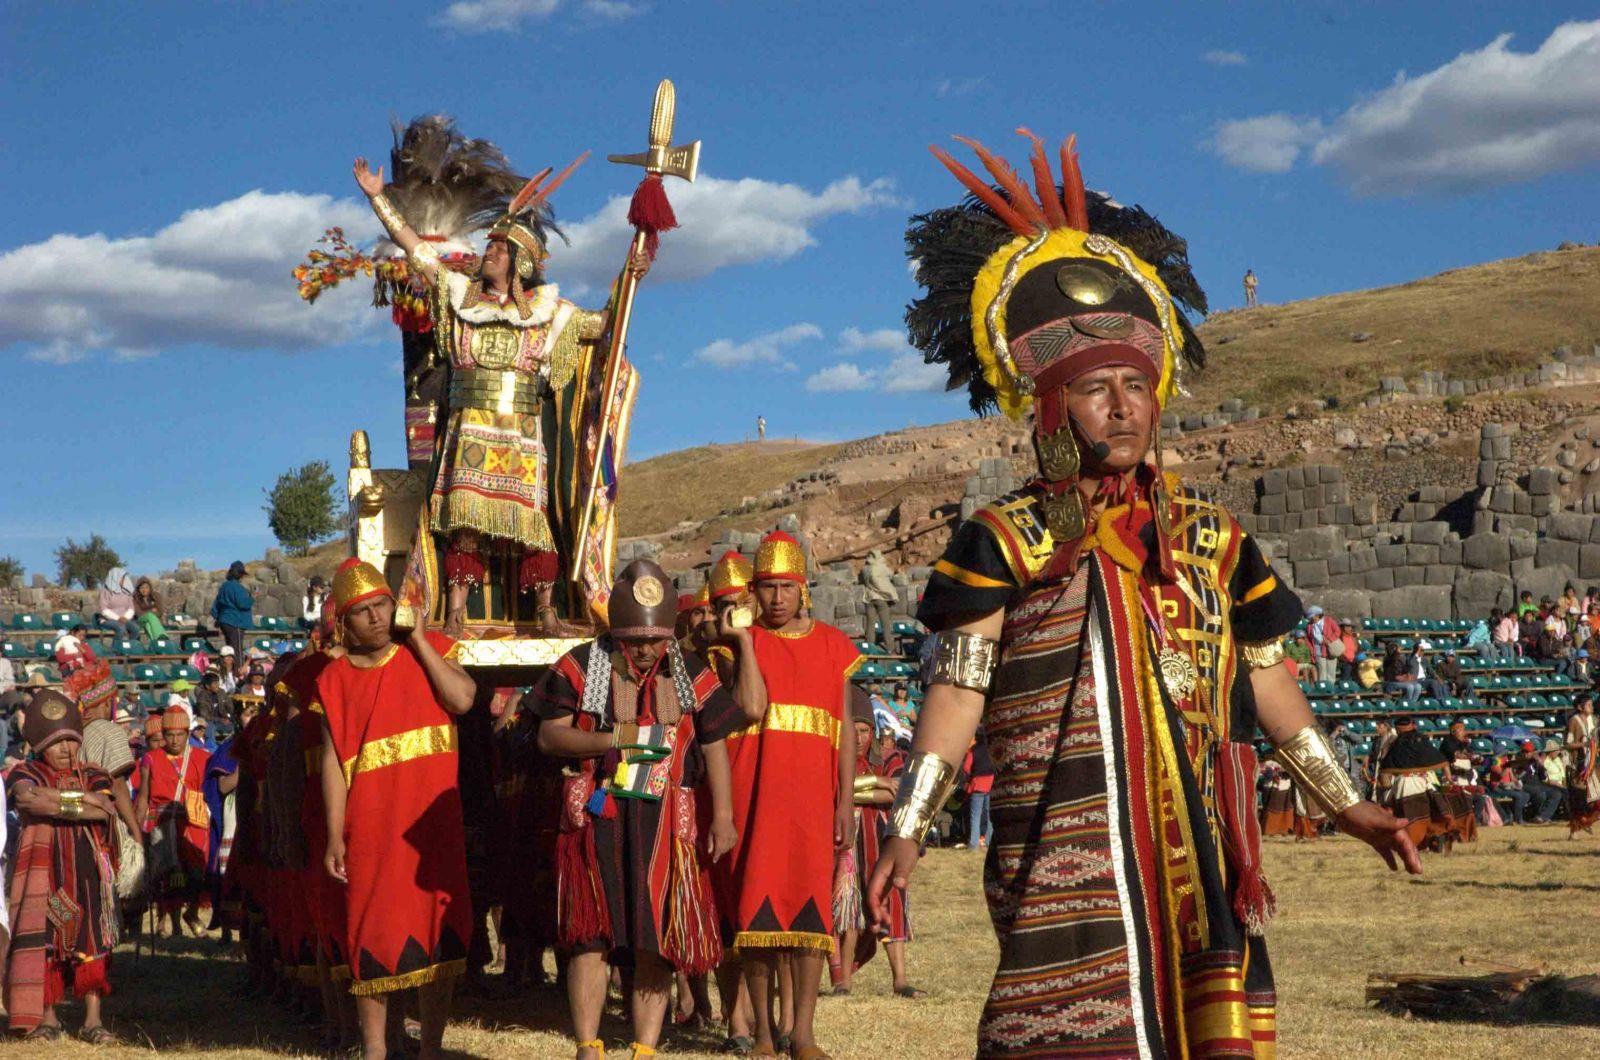 معلومات عن حضارة الانكا The-Inca-Empire-also-known-as-the-Incan-Empire-was-the-largest-empire-in-pre-Columbian-America